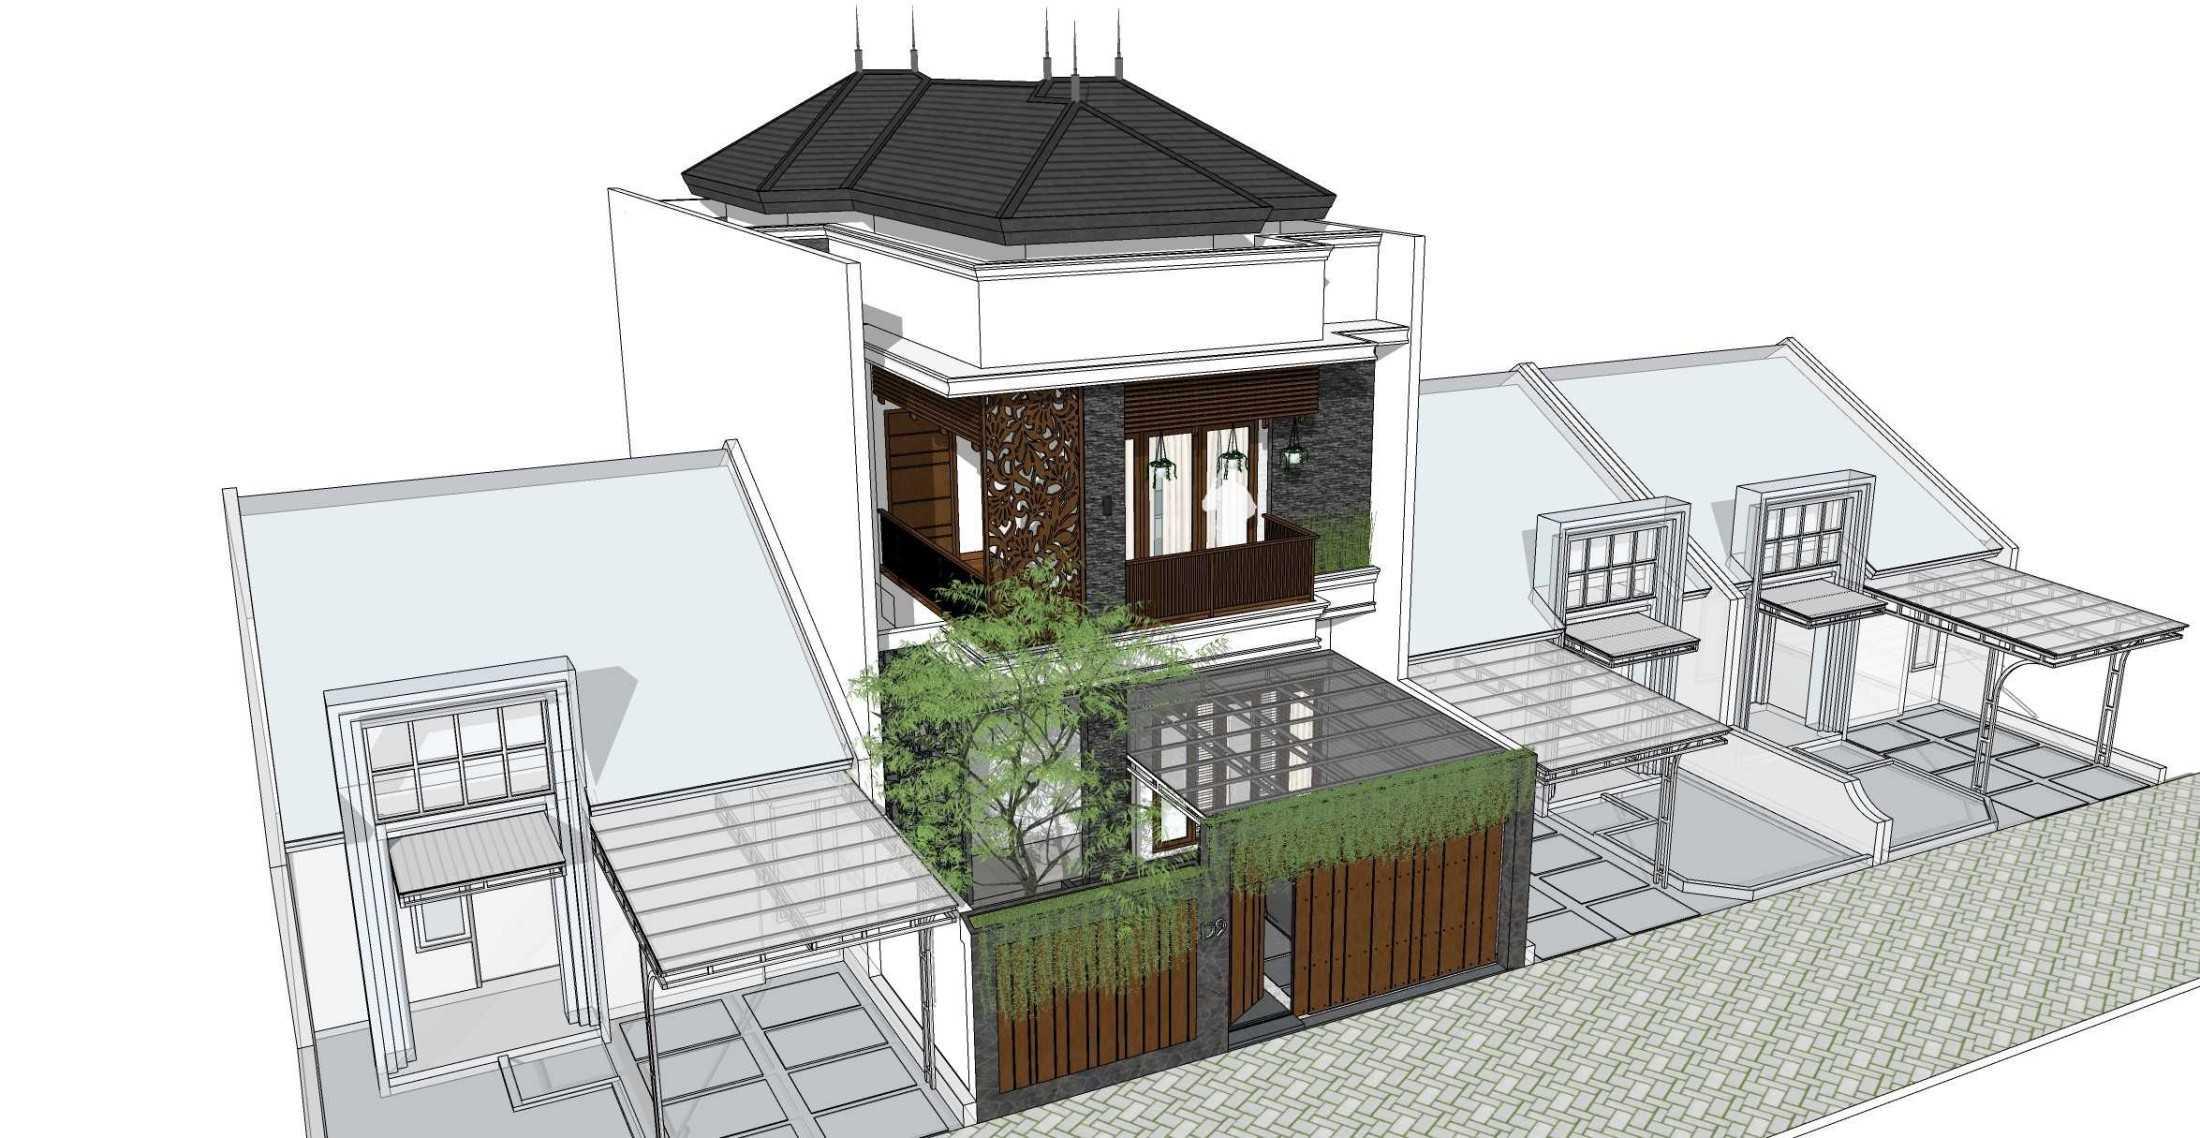 Miv Architect (Alfachri Kamarullah) El + House Barombong, Tamalate, Kota Makassar, Sulawesi Selatan, Indonesia Barombong, Tamalate, Kota Makassar, Sulawesi Selatan, Indonesia Alfachri-Kamarullah-El-House  59755